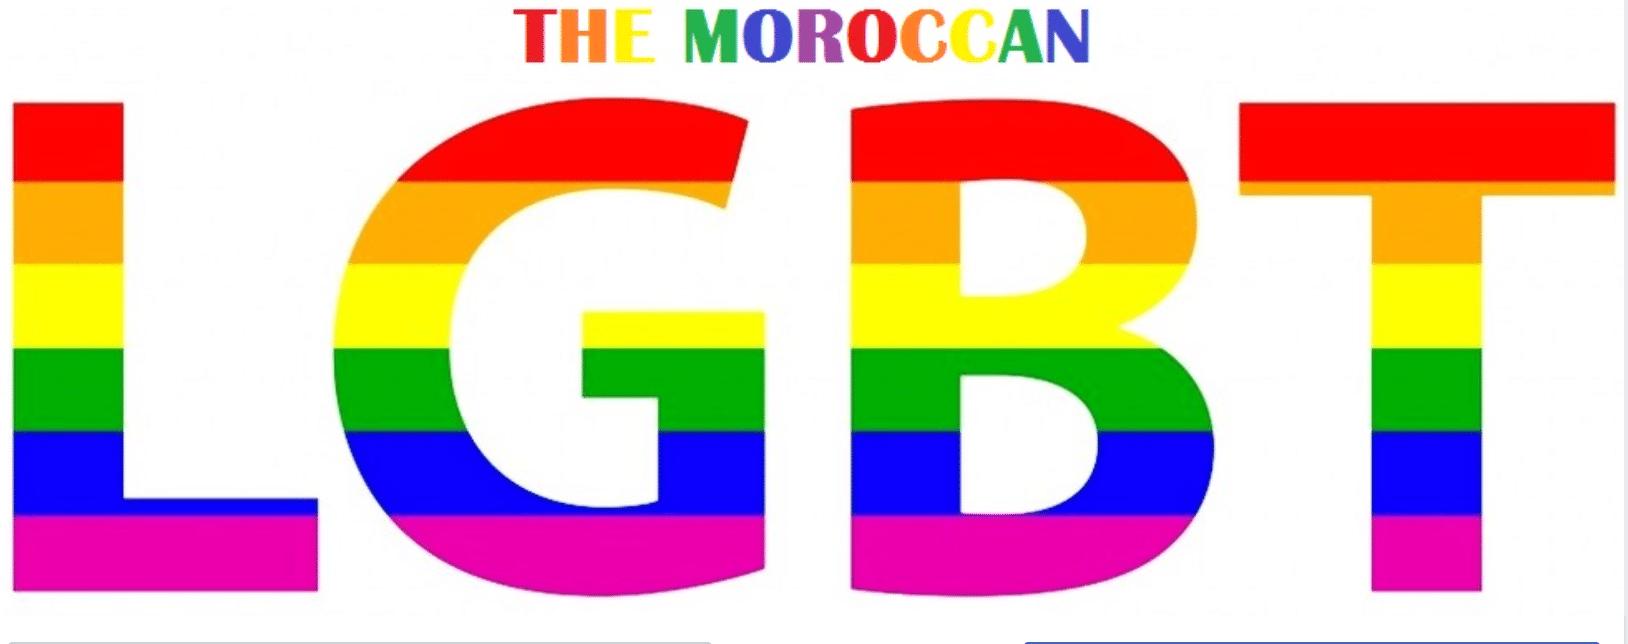 Love & Violence: Inside Morocco's LGBT+ Community, Love & Violence: Inside Morocco's LGBT+ Community